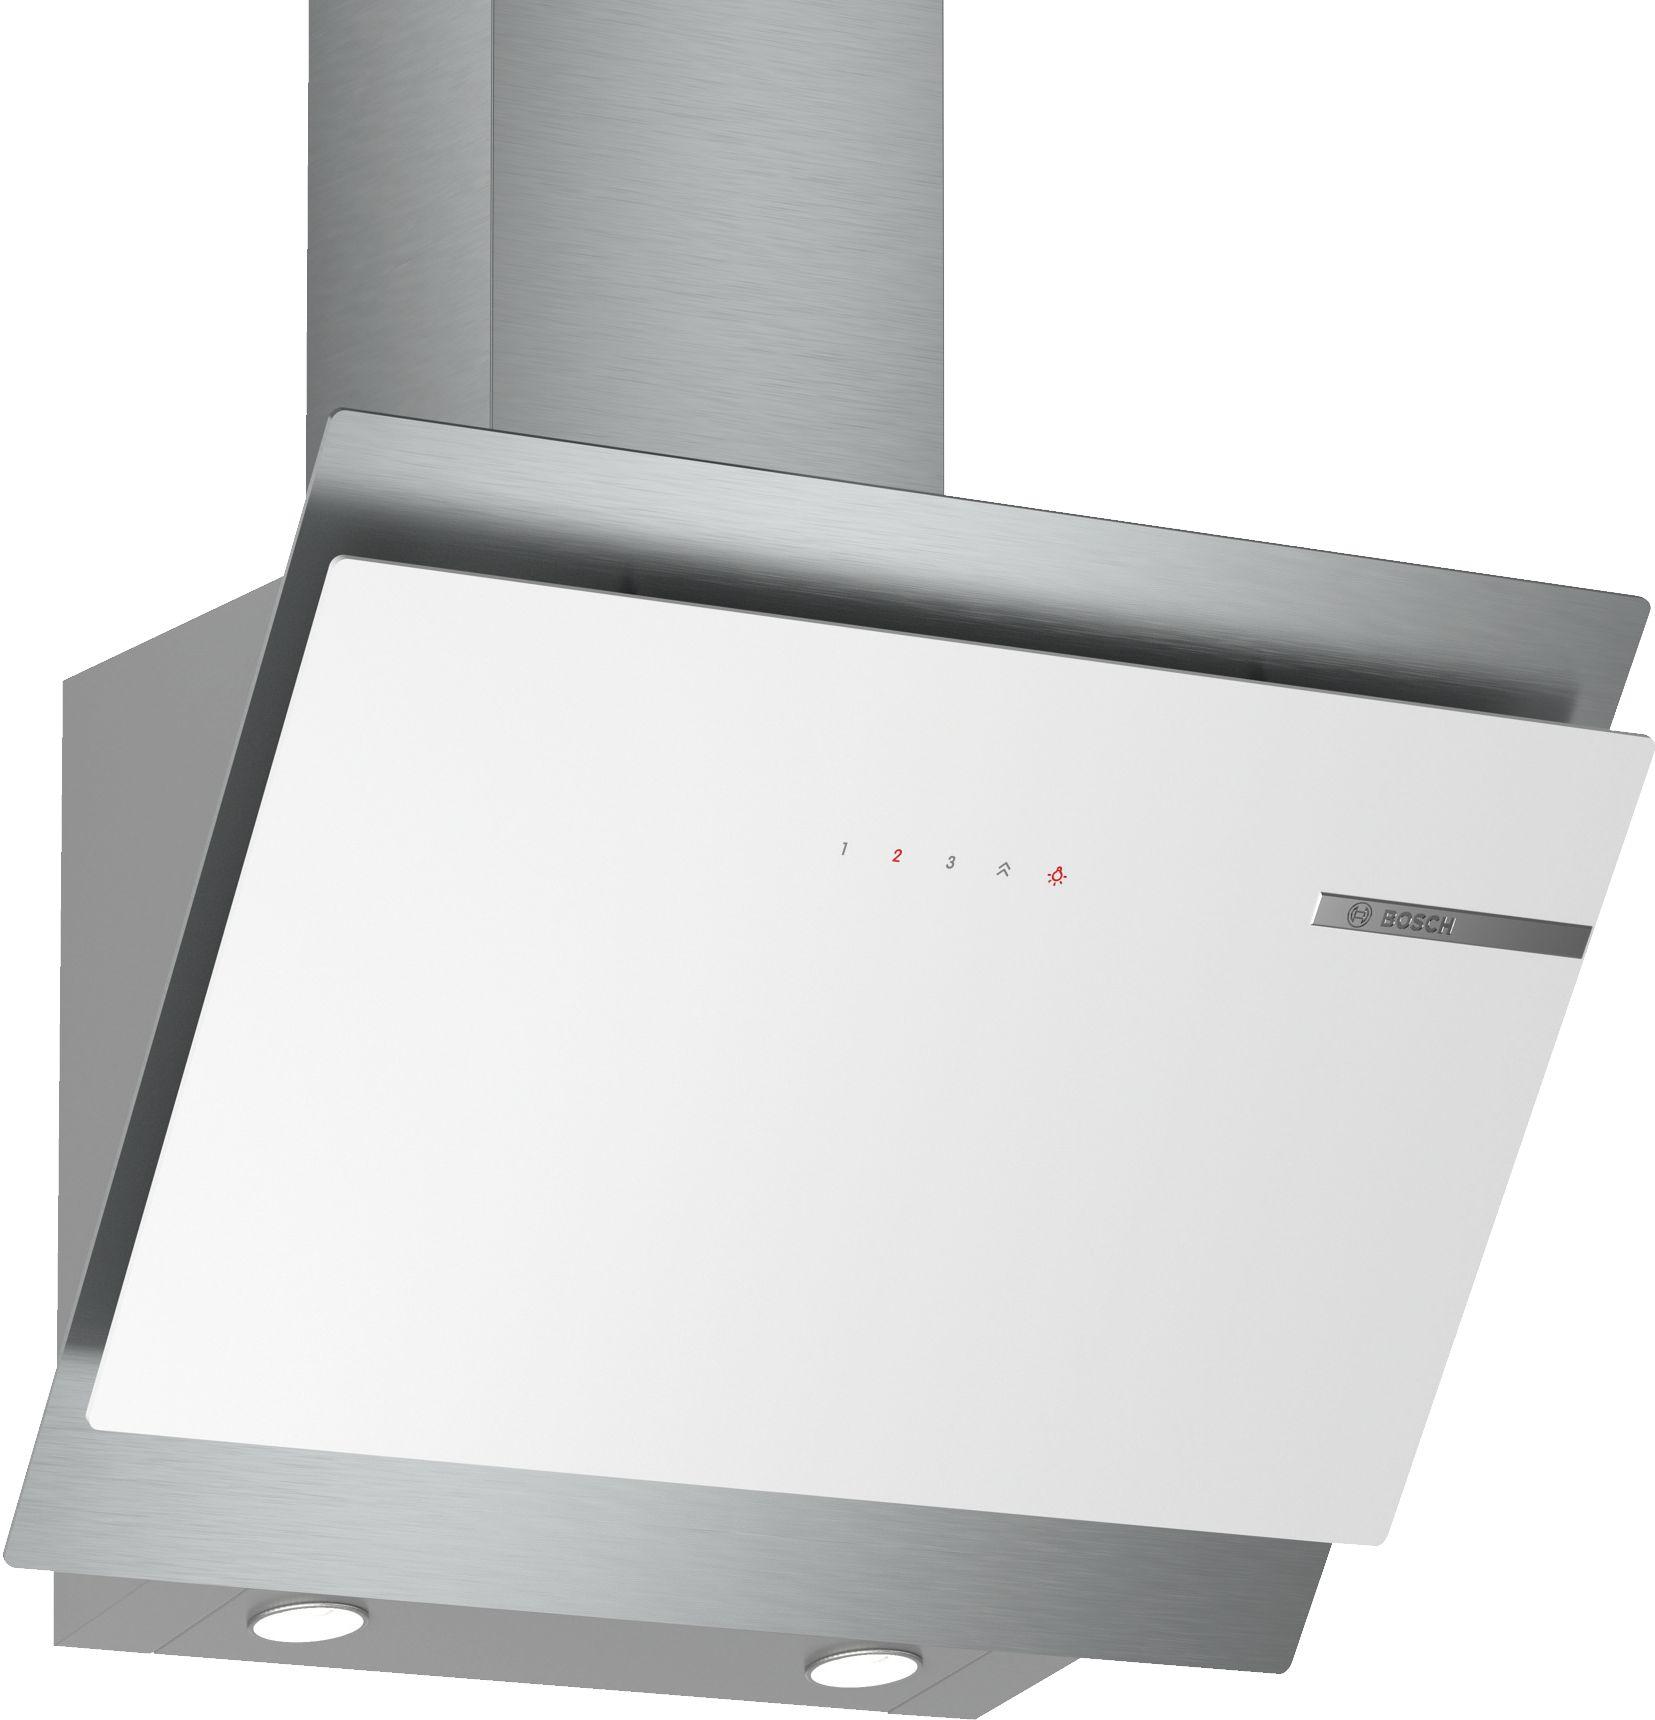 Вытяжка Bosch DWK68AK20R